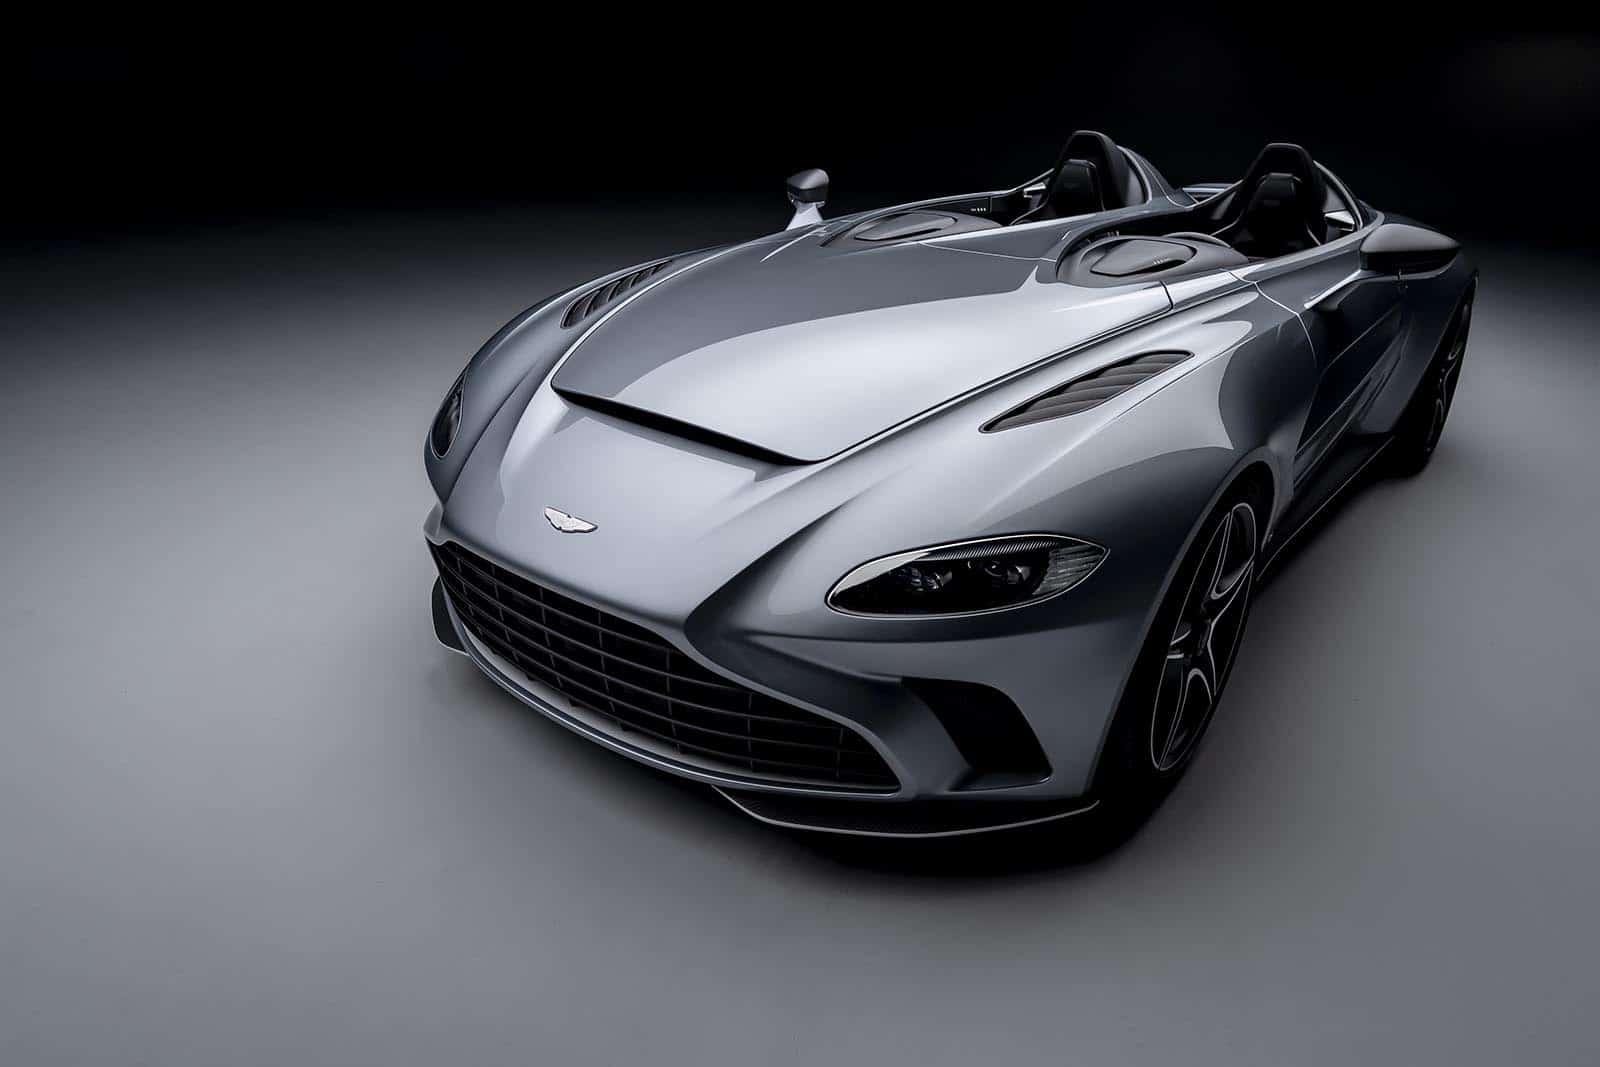 Exclusive Aston Martin V12 Speedster Blends Past And Future The Detroit Bureau